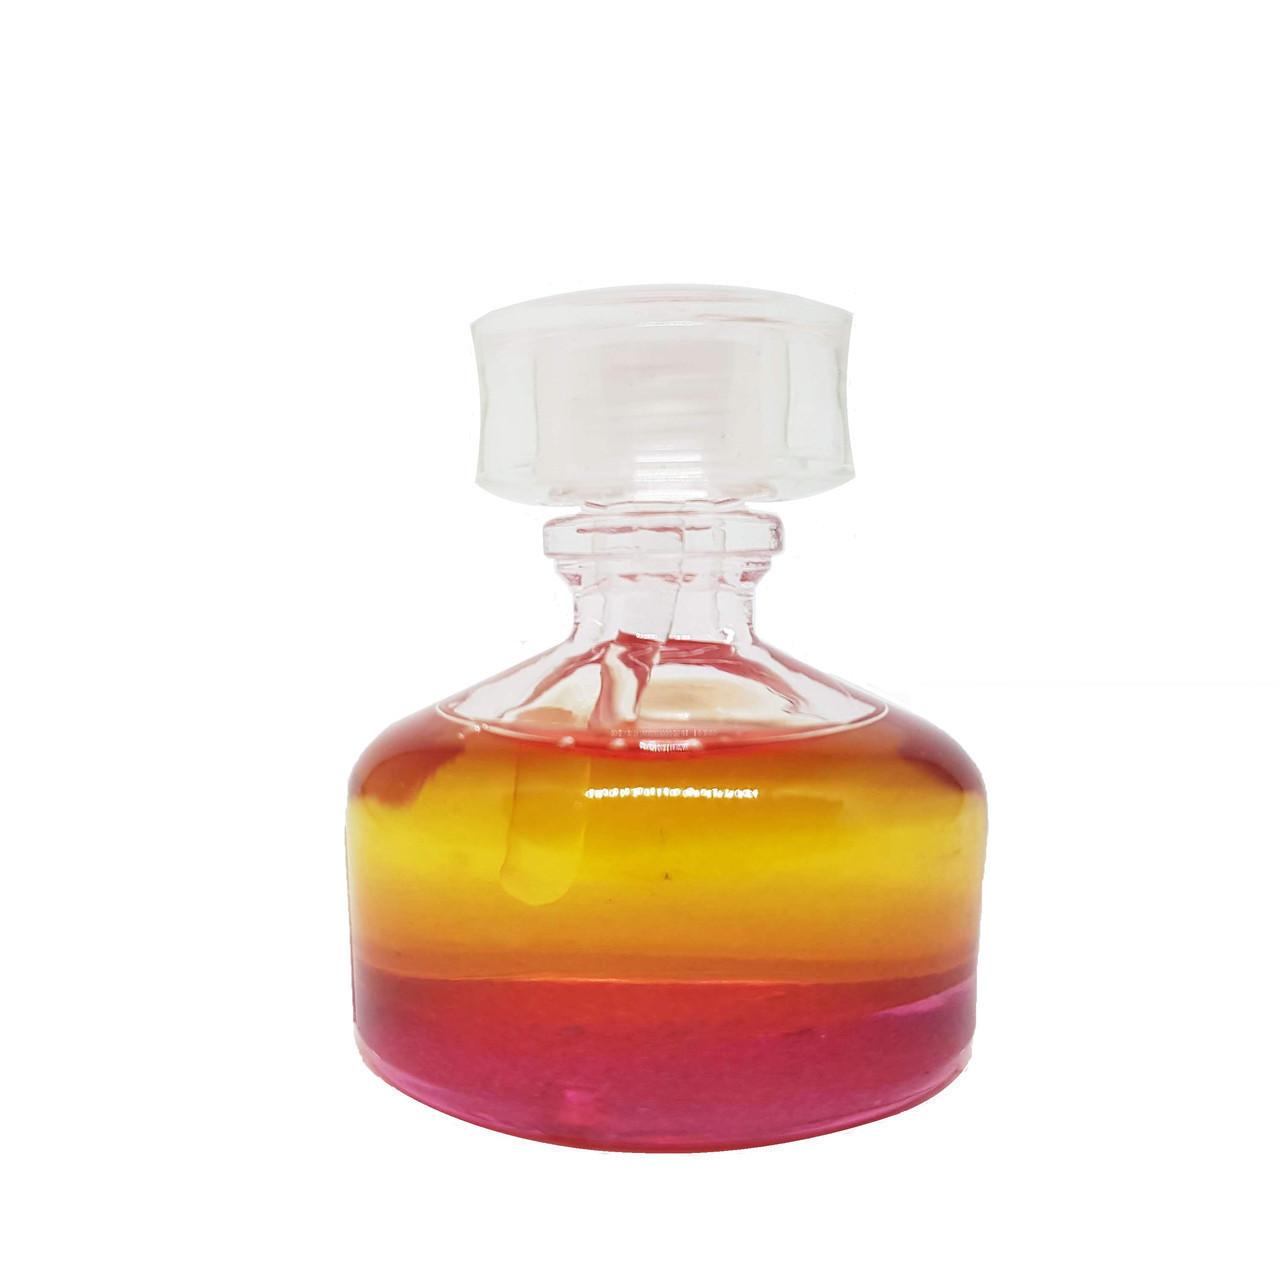 Sospiro Huile De Parfum 20ml продажа цена в харькове парфюмерия